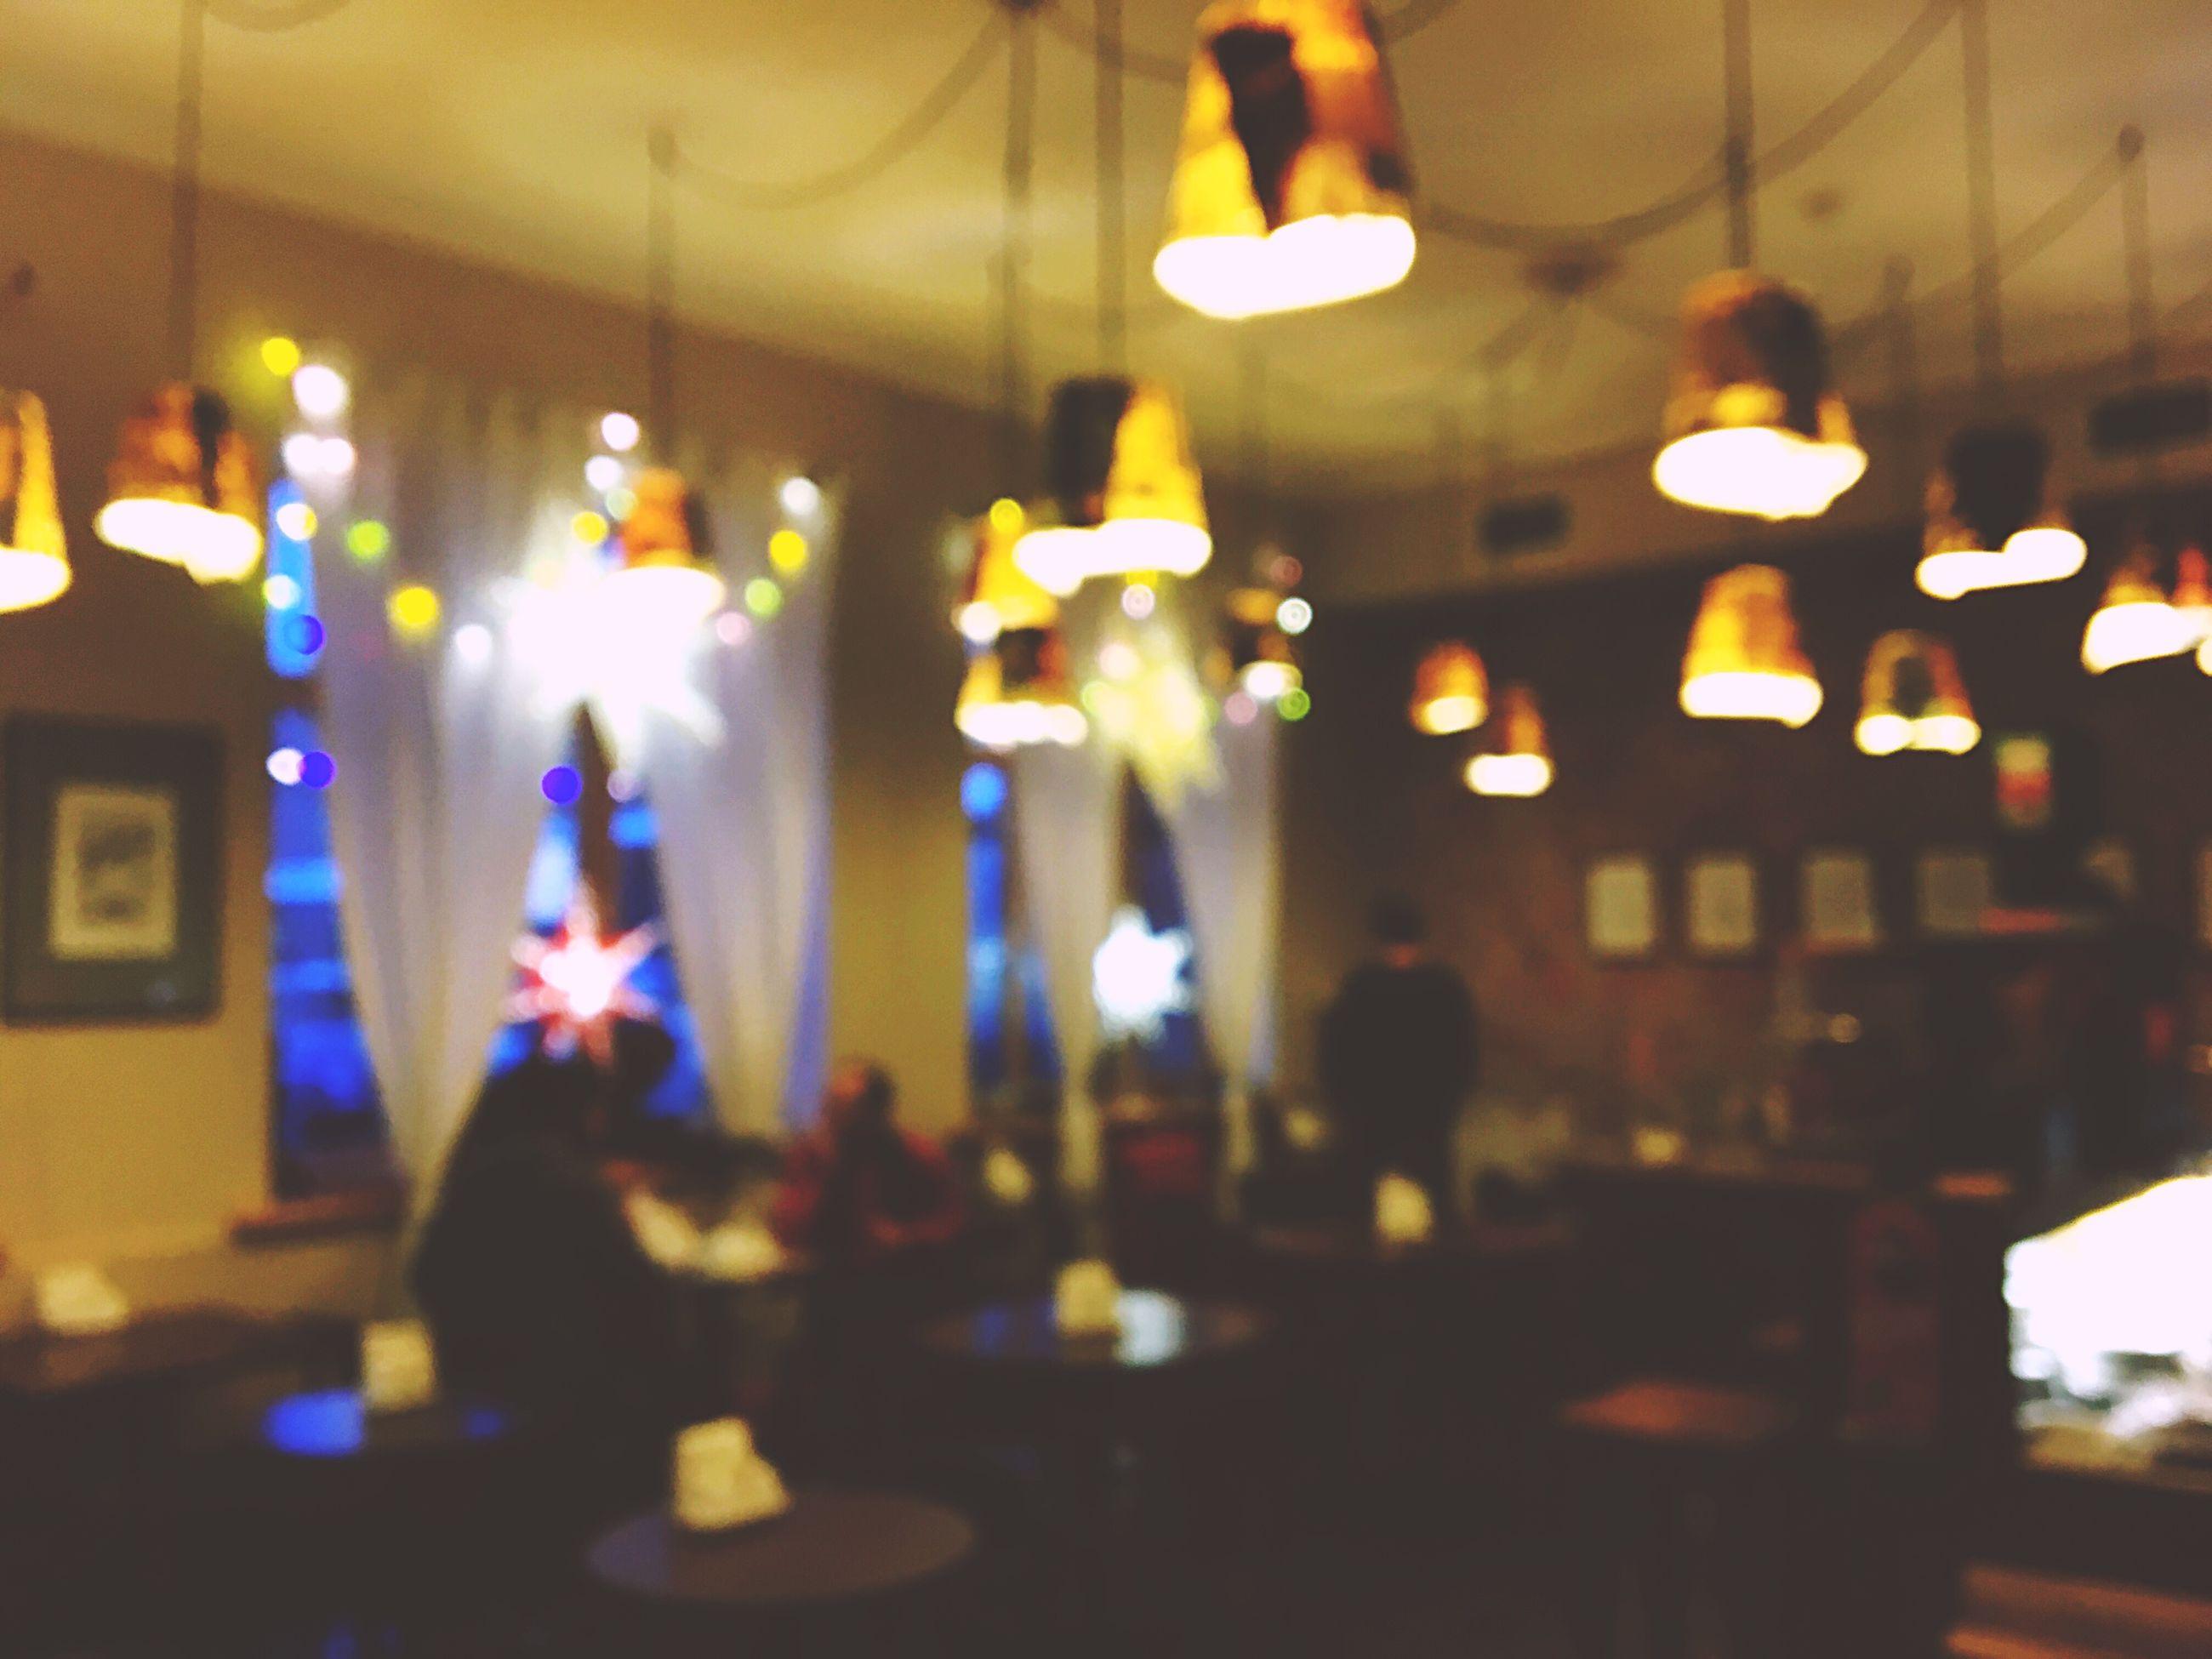 illuminated, lighting equipment, night, indoors, no people